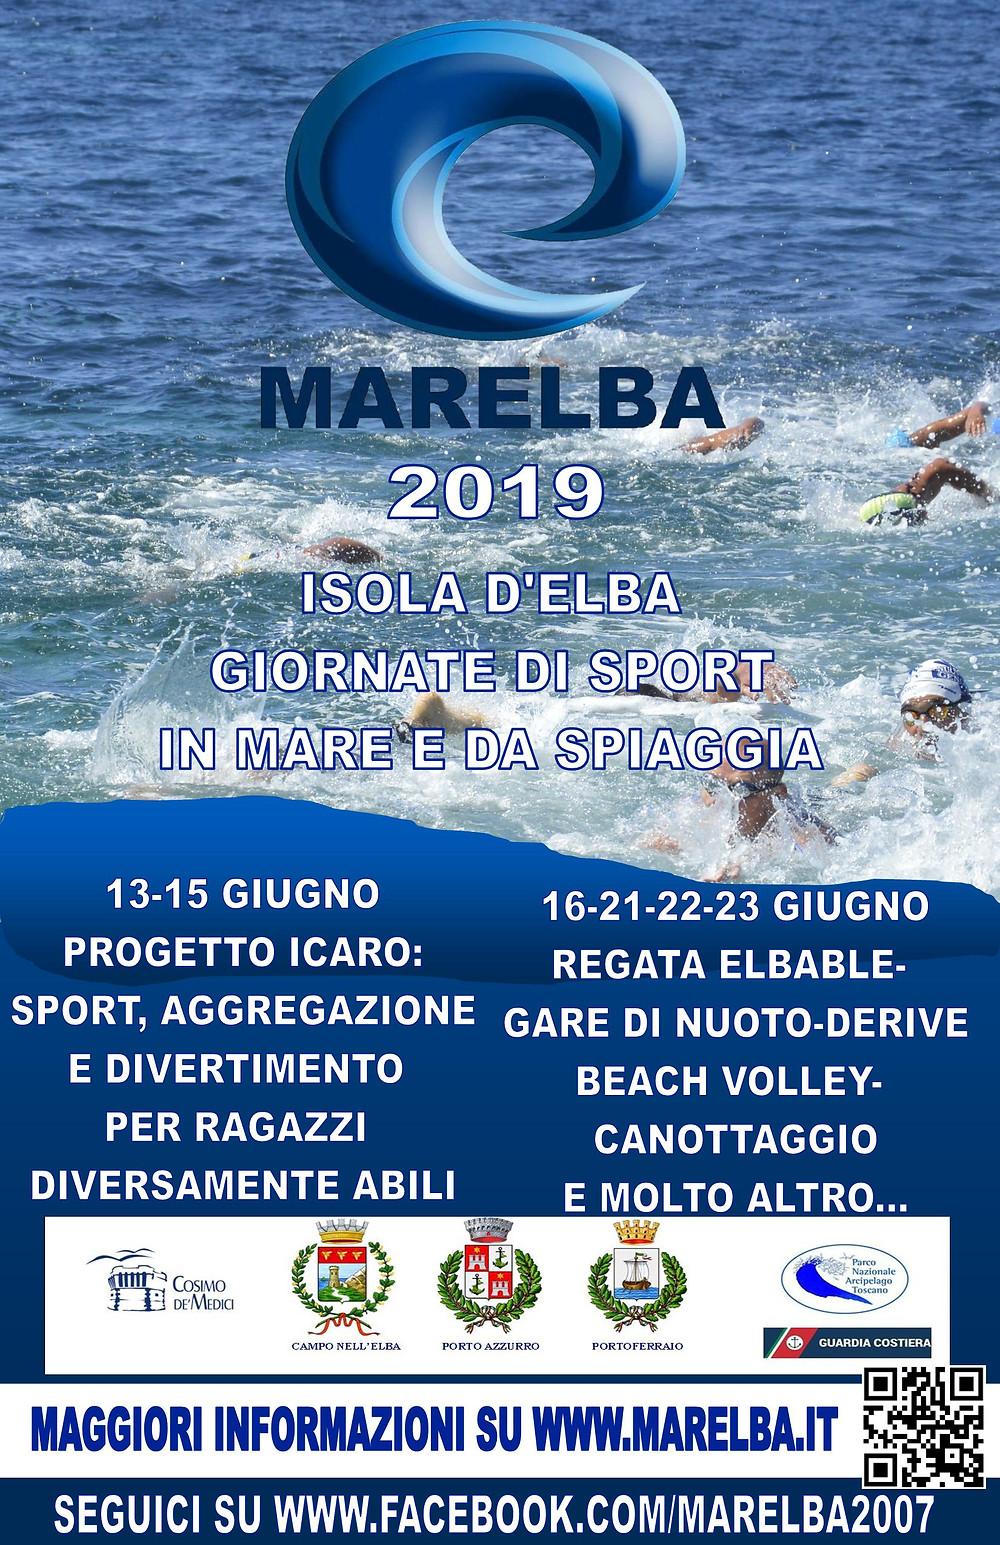 Marelba 2019 locandina eventi sportivi Elba